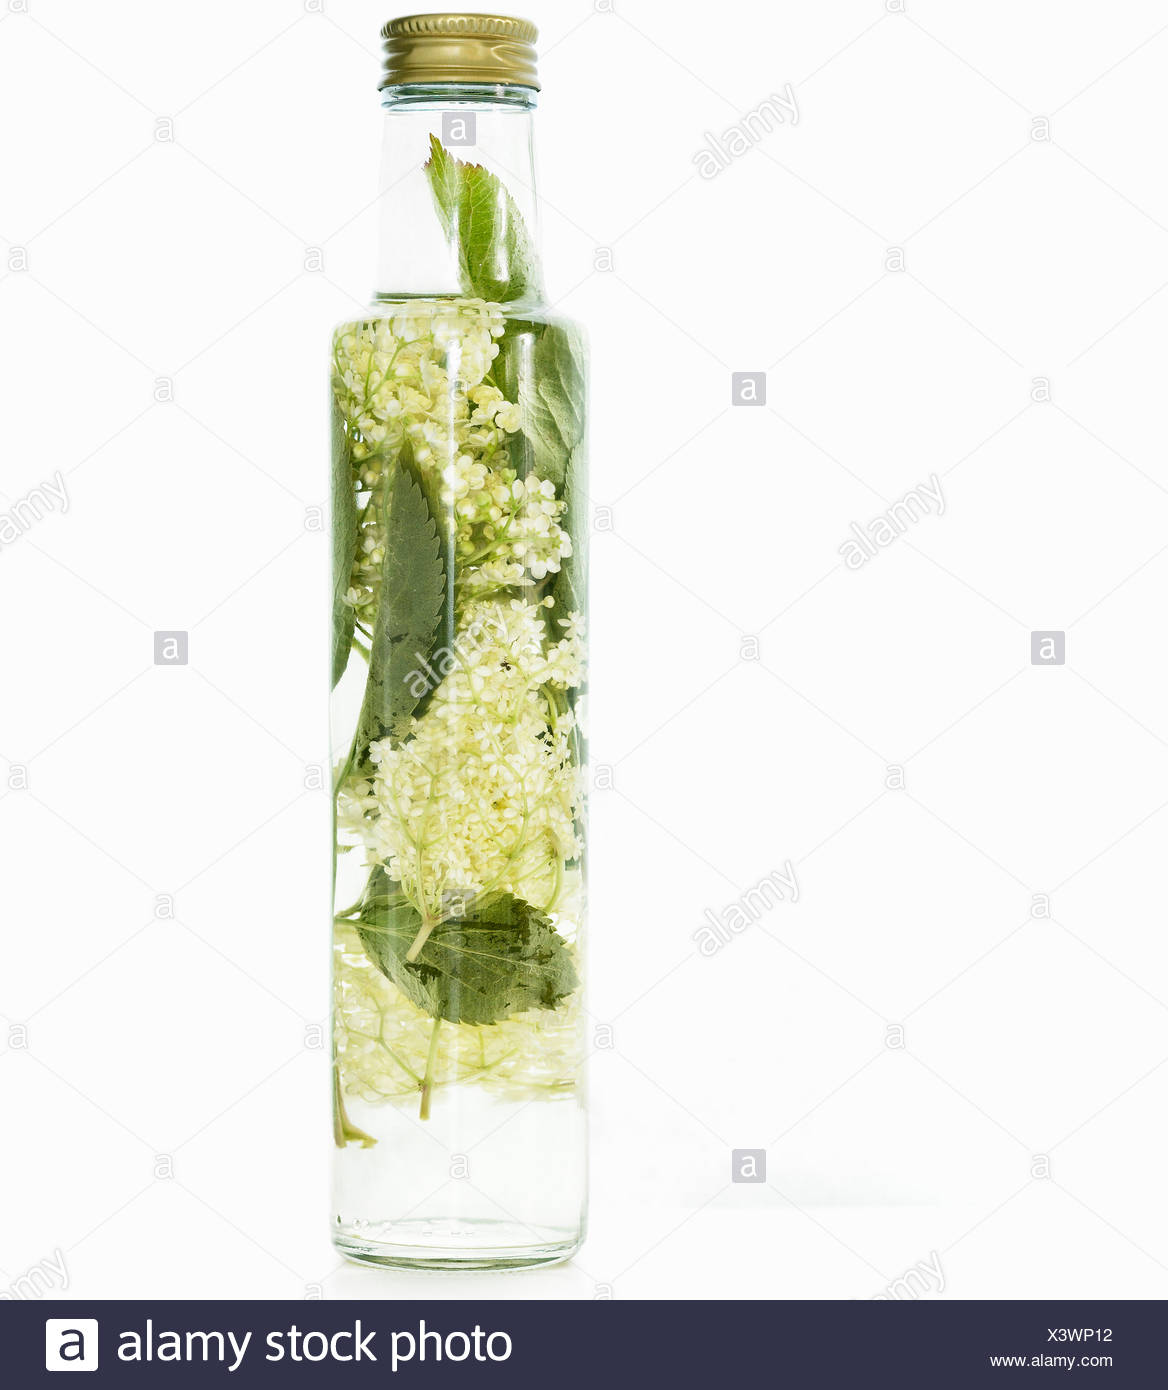 Bottle of herbed olive oil - Stock Image